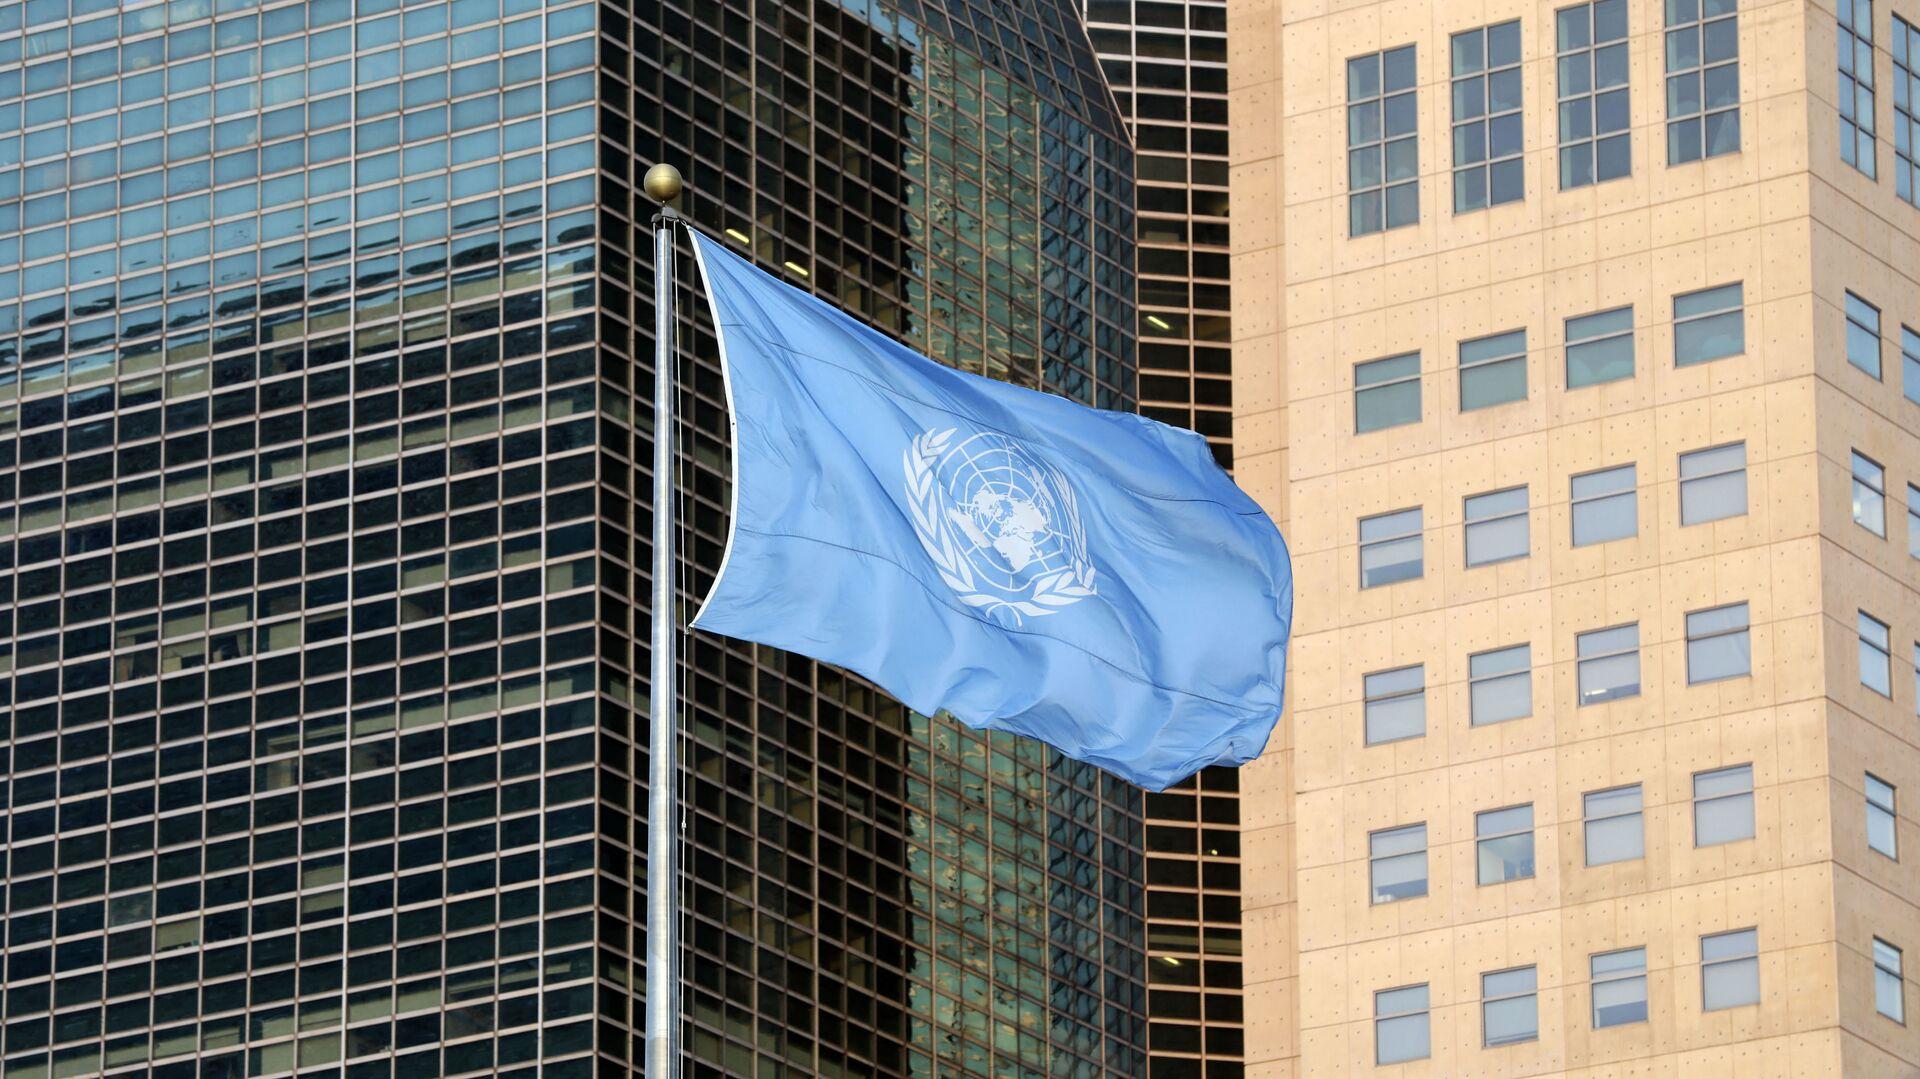 Флаг ООН, фото из архива - Sputnik Azərbaycan, 1920, 26.09.2021